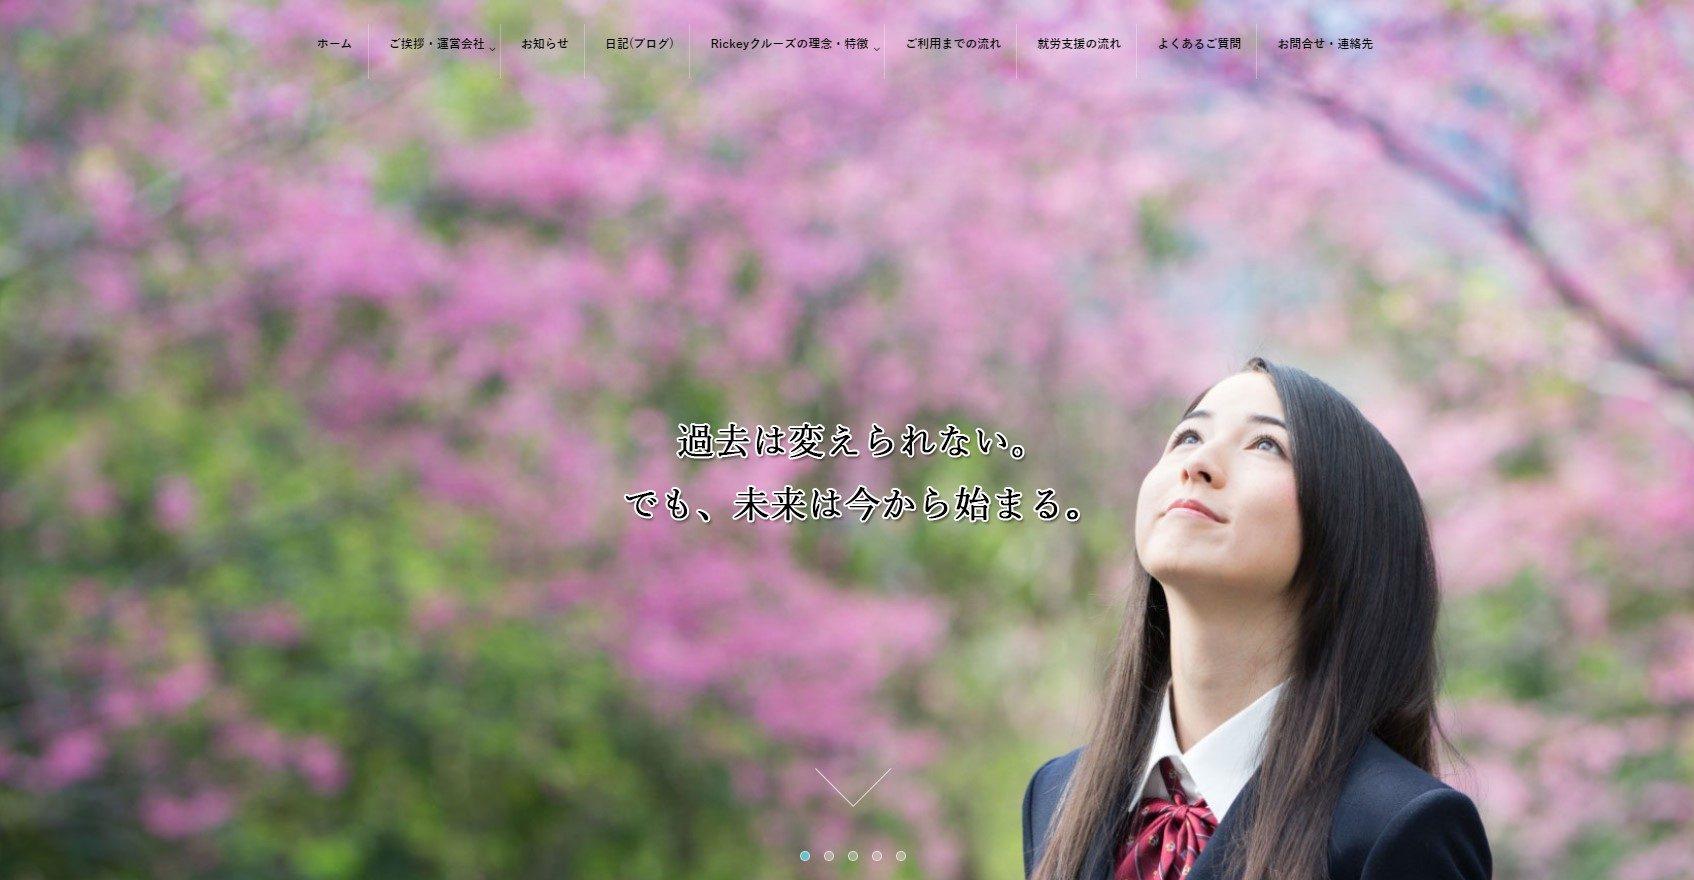 SnapCrab_NoName_2017-4-20_18-5-30_No-00